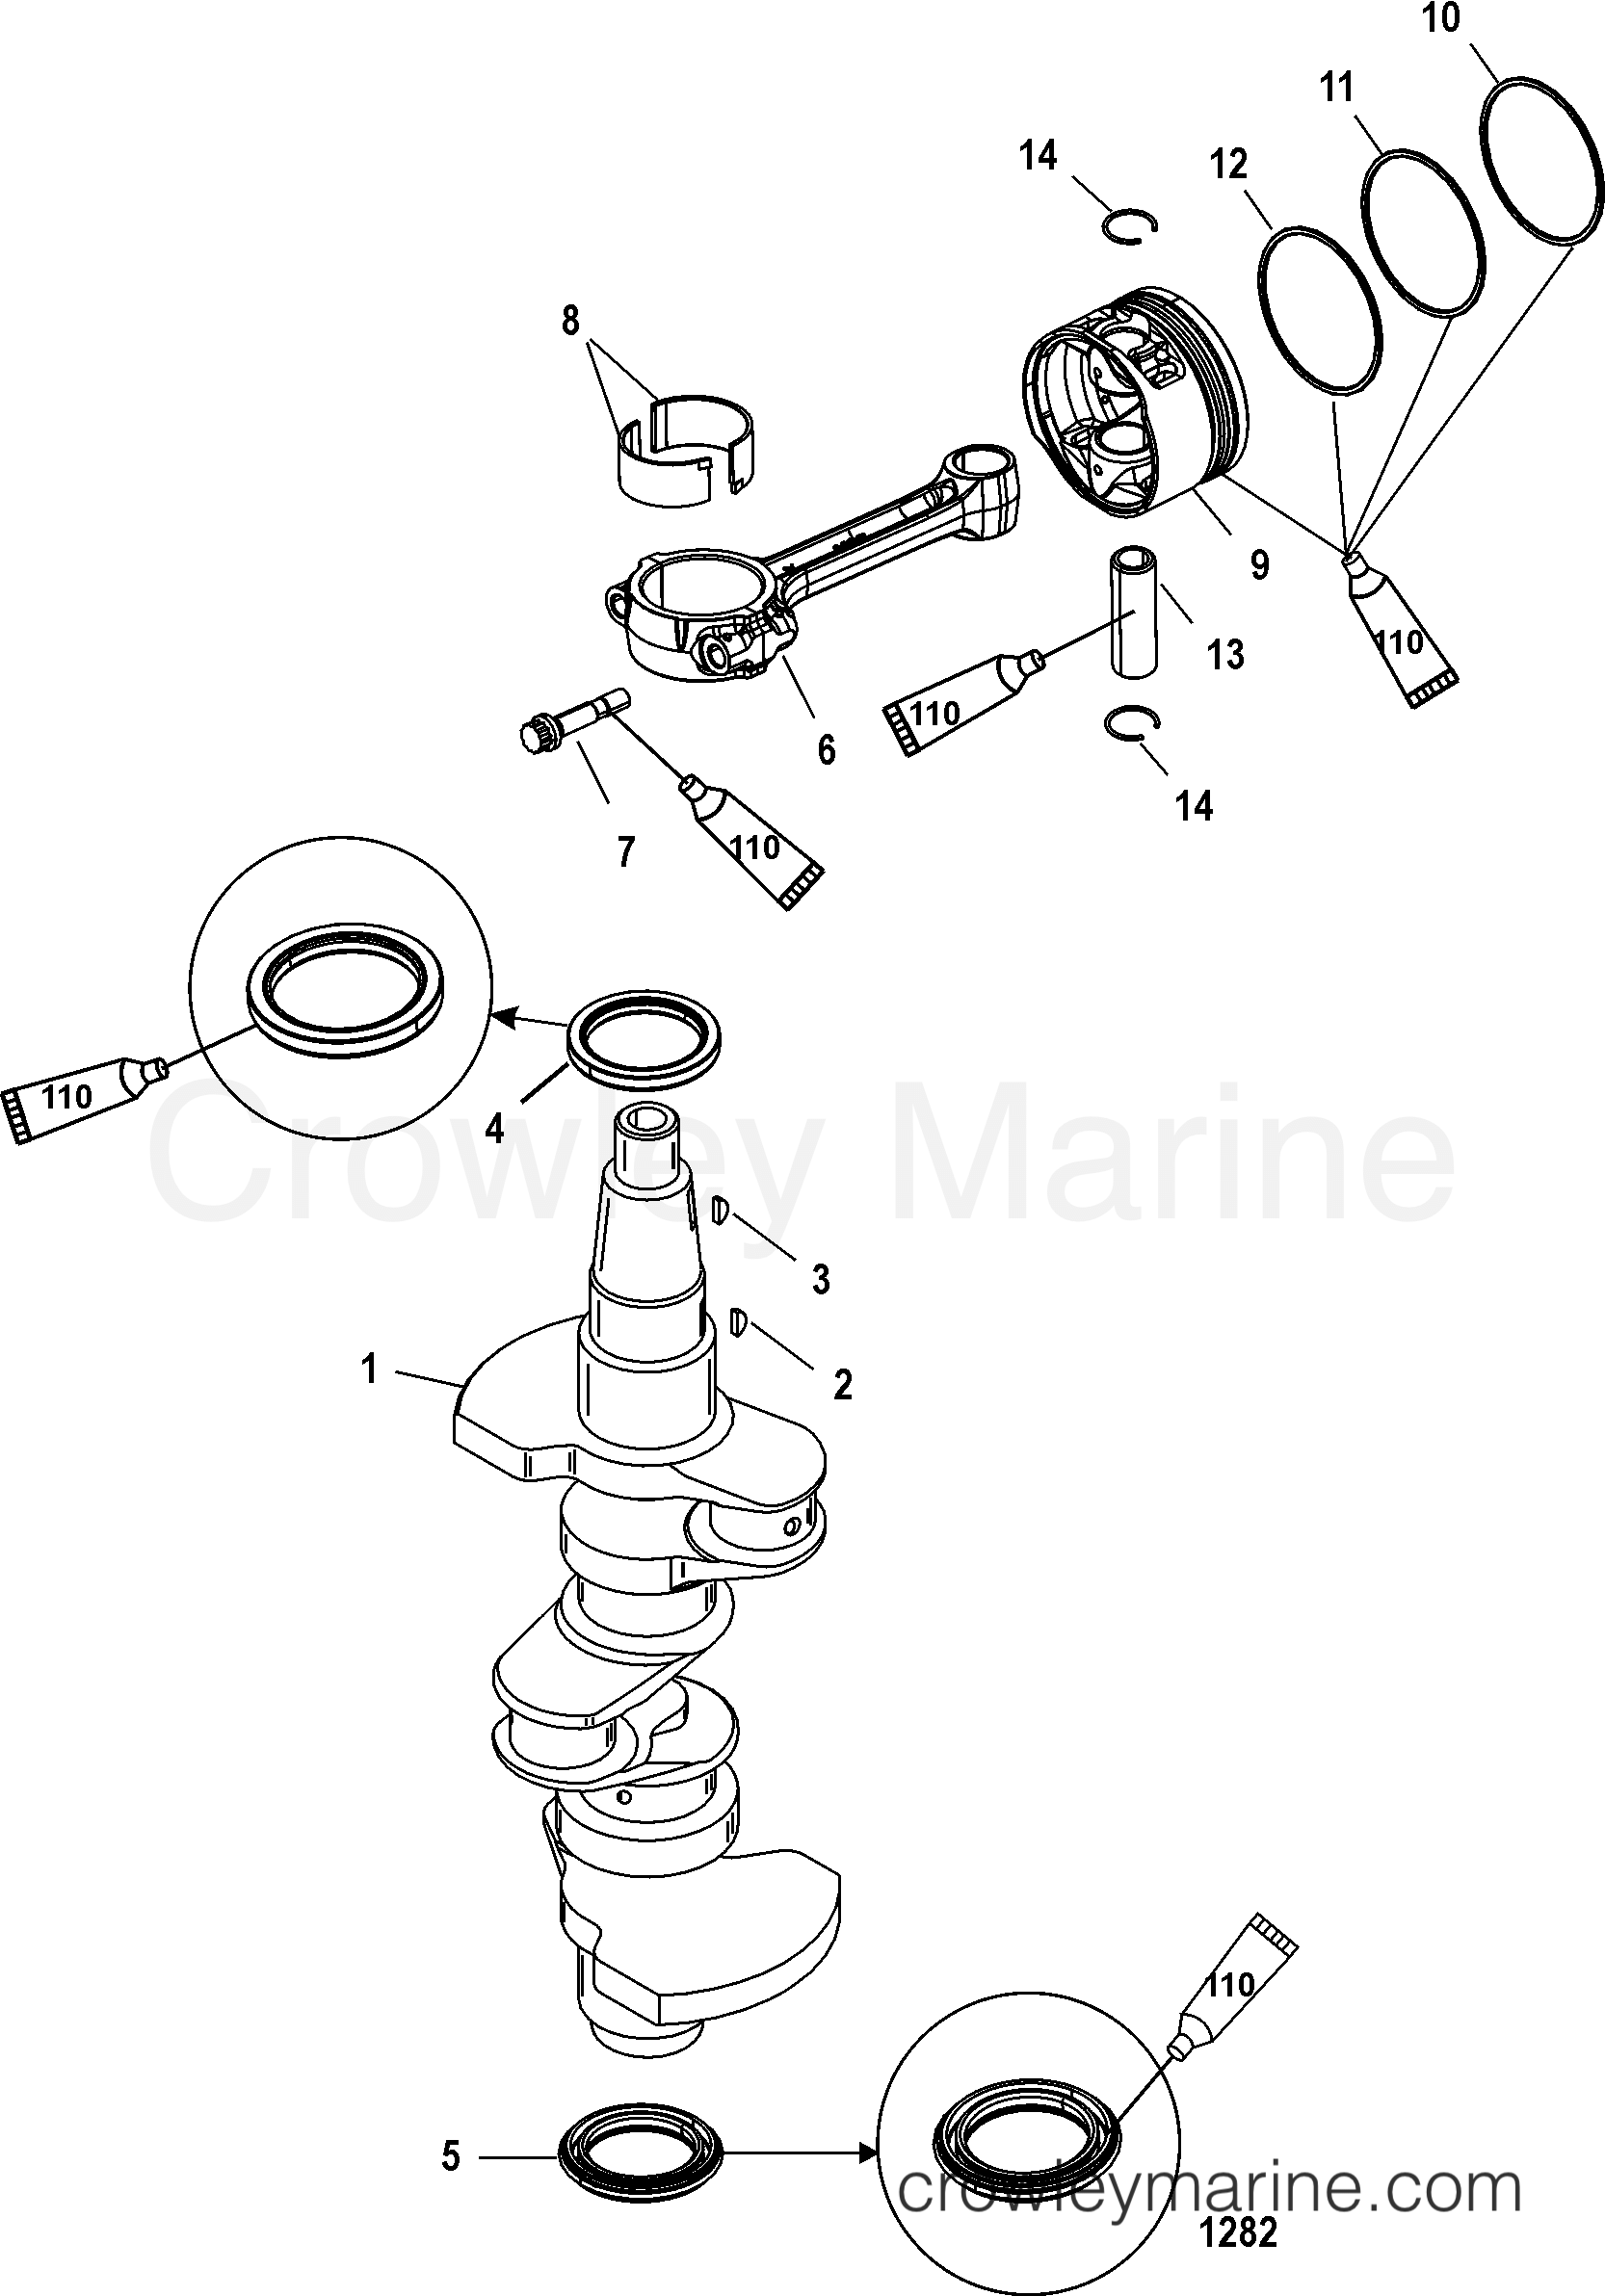 BRAND NEW OEM MERCURY MERCRUISER GASKET SET PART #27-825231A02